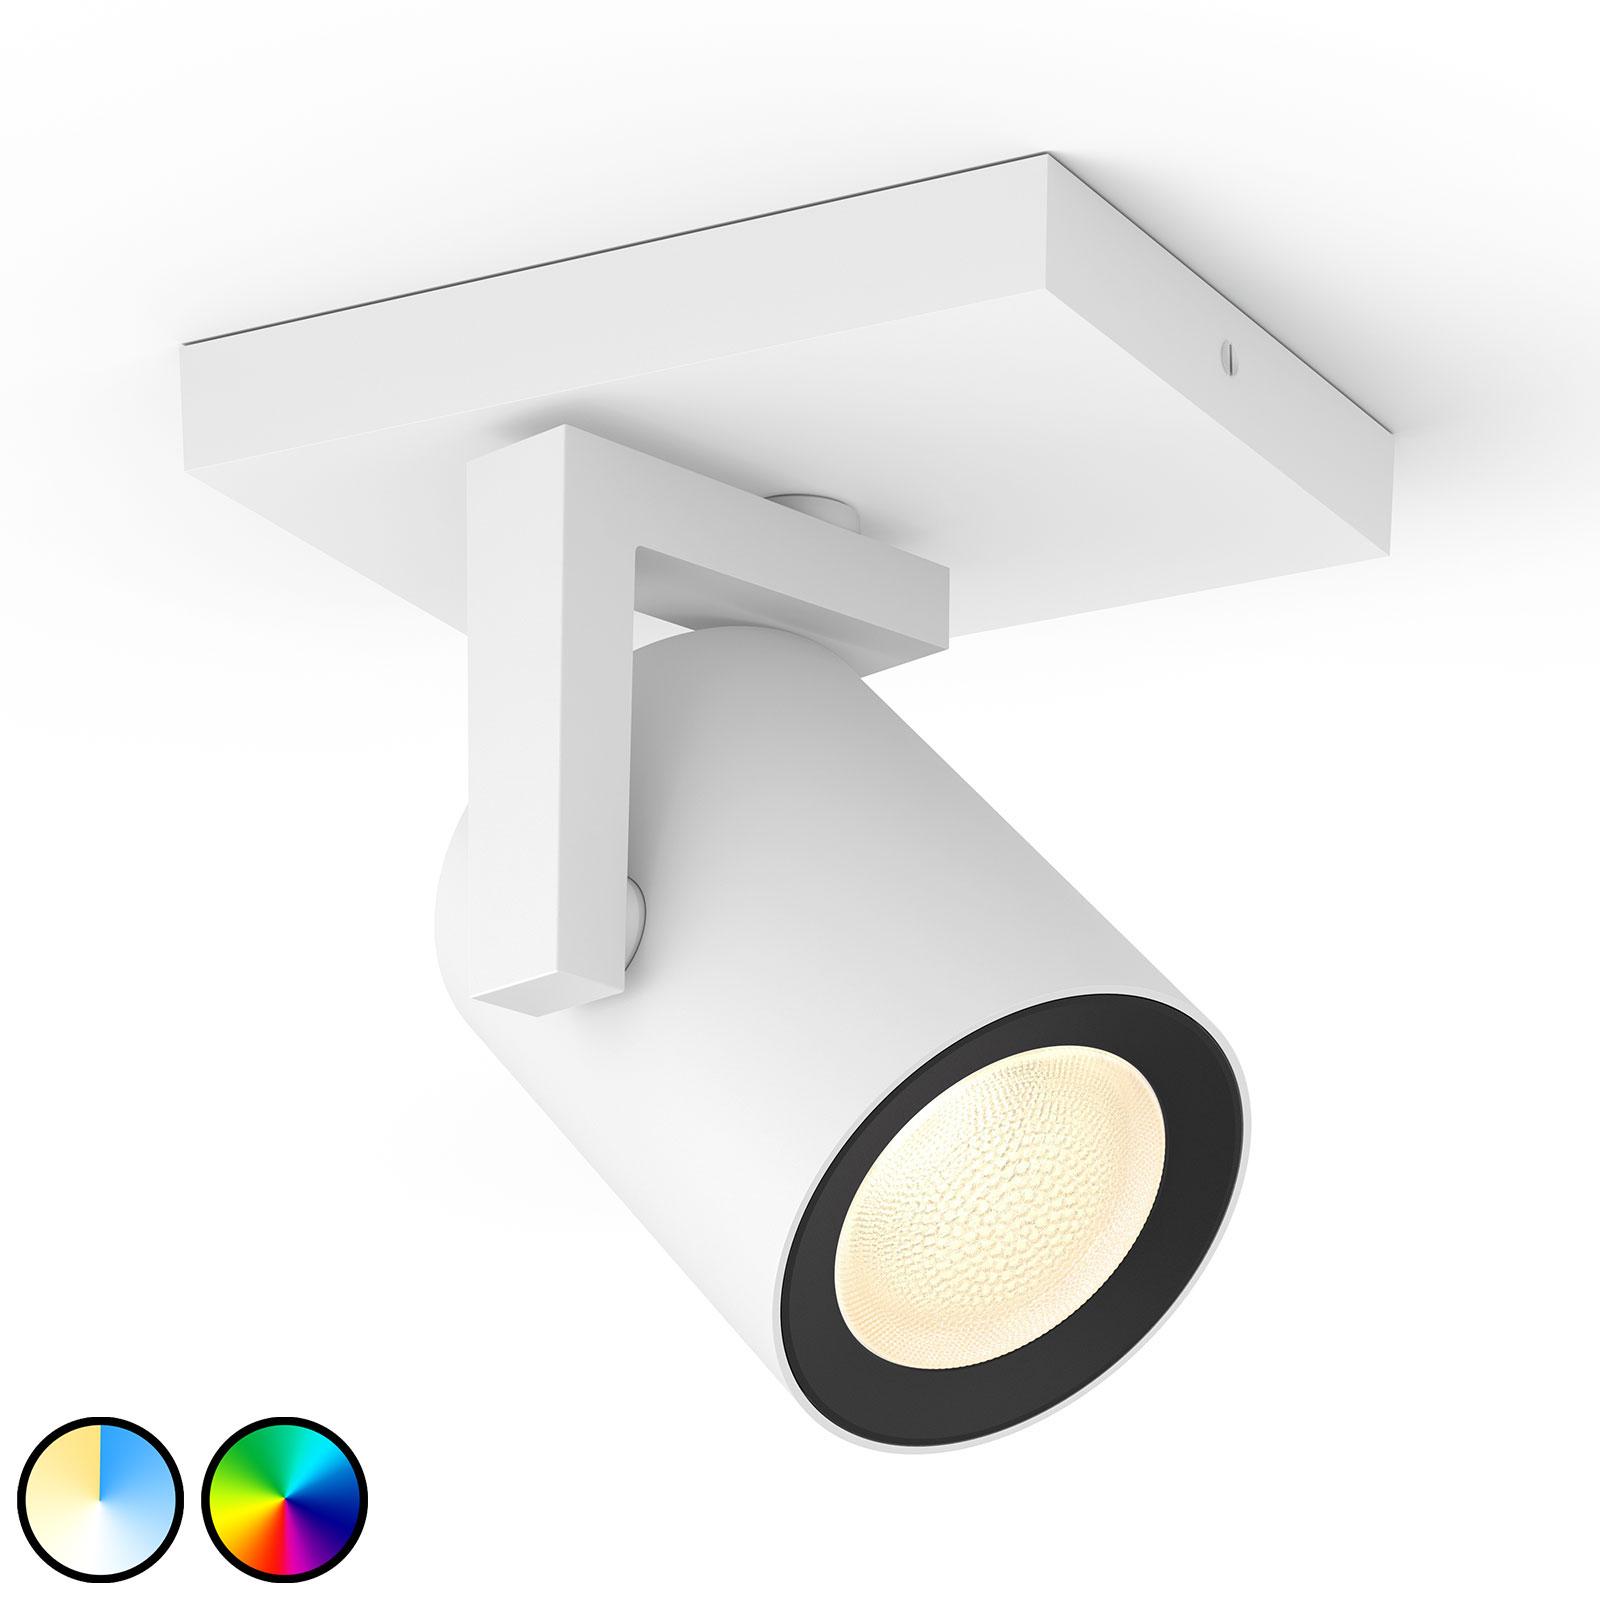 Philips Hue Argenta foco LED, 1 luz, blanco